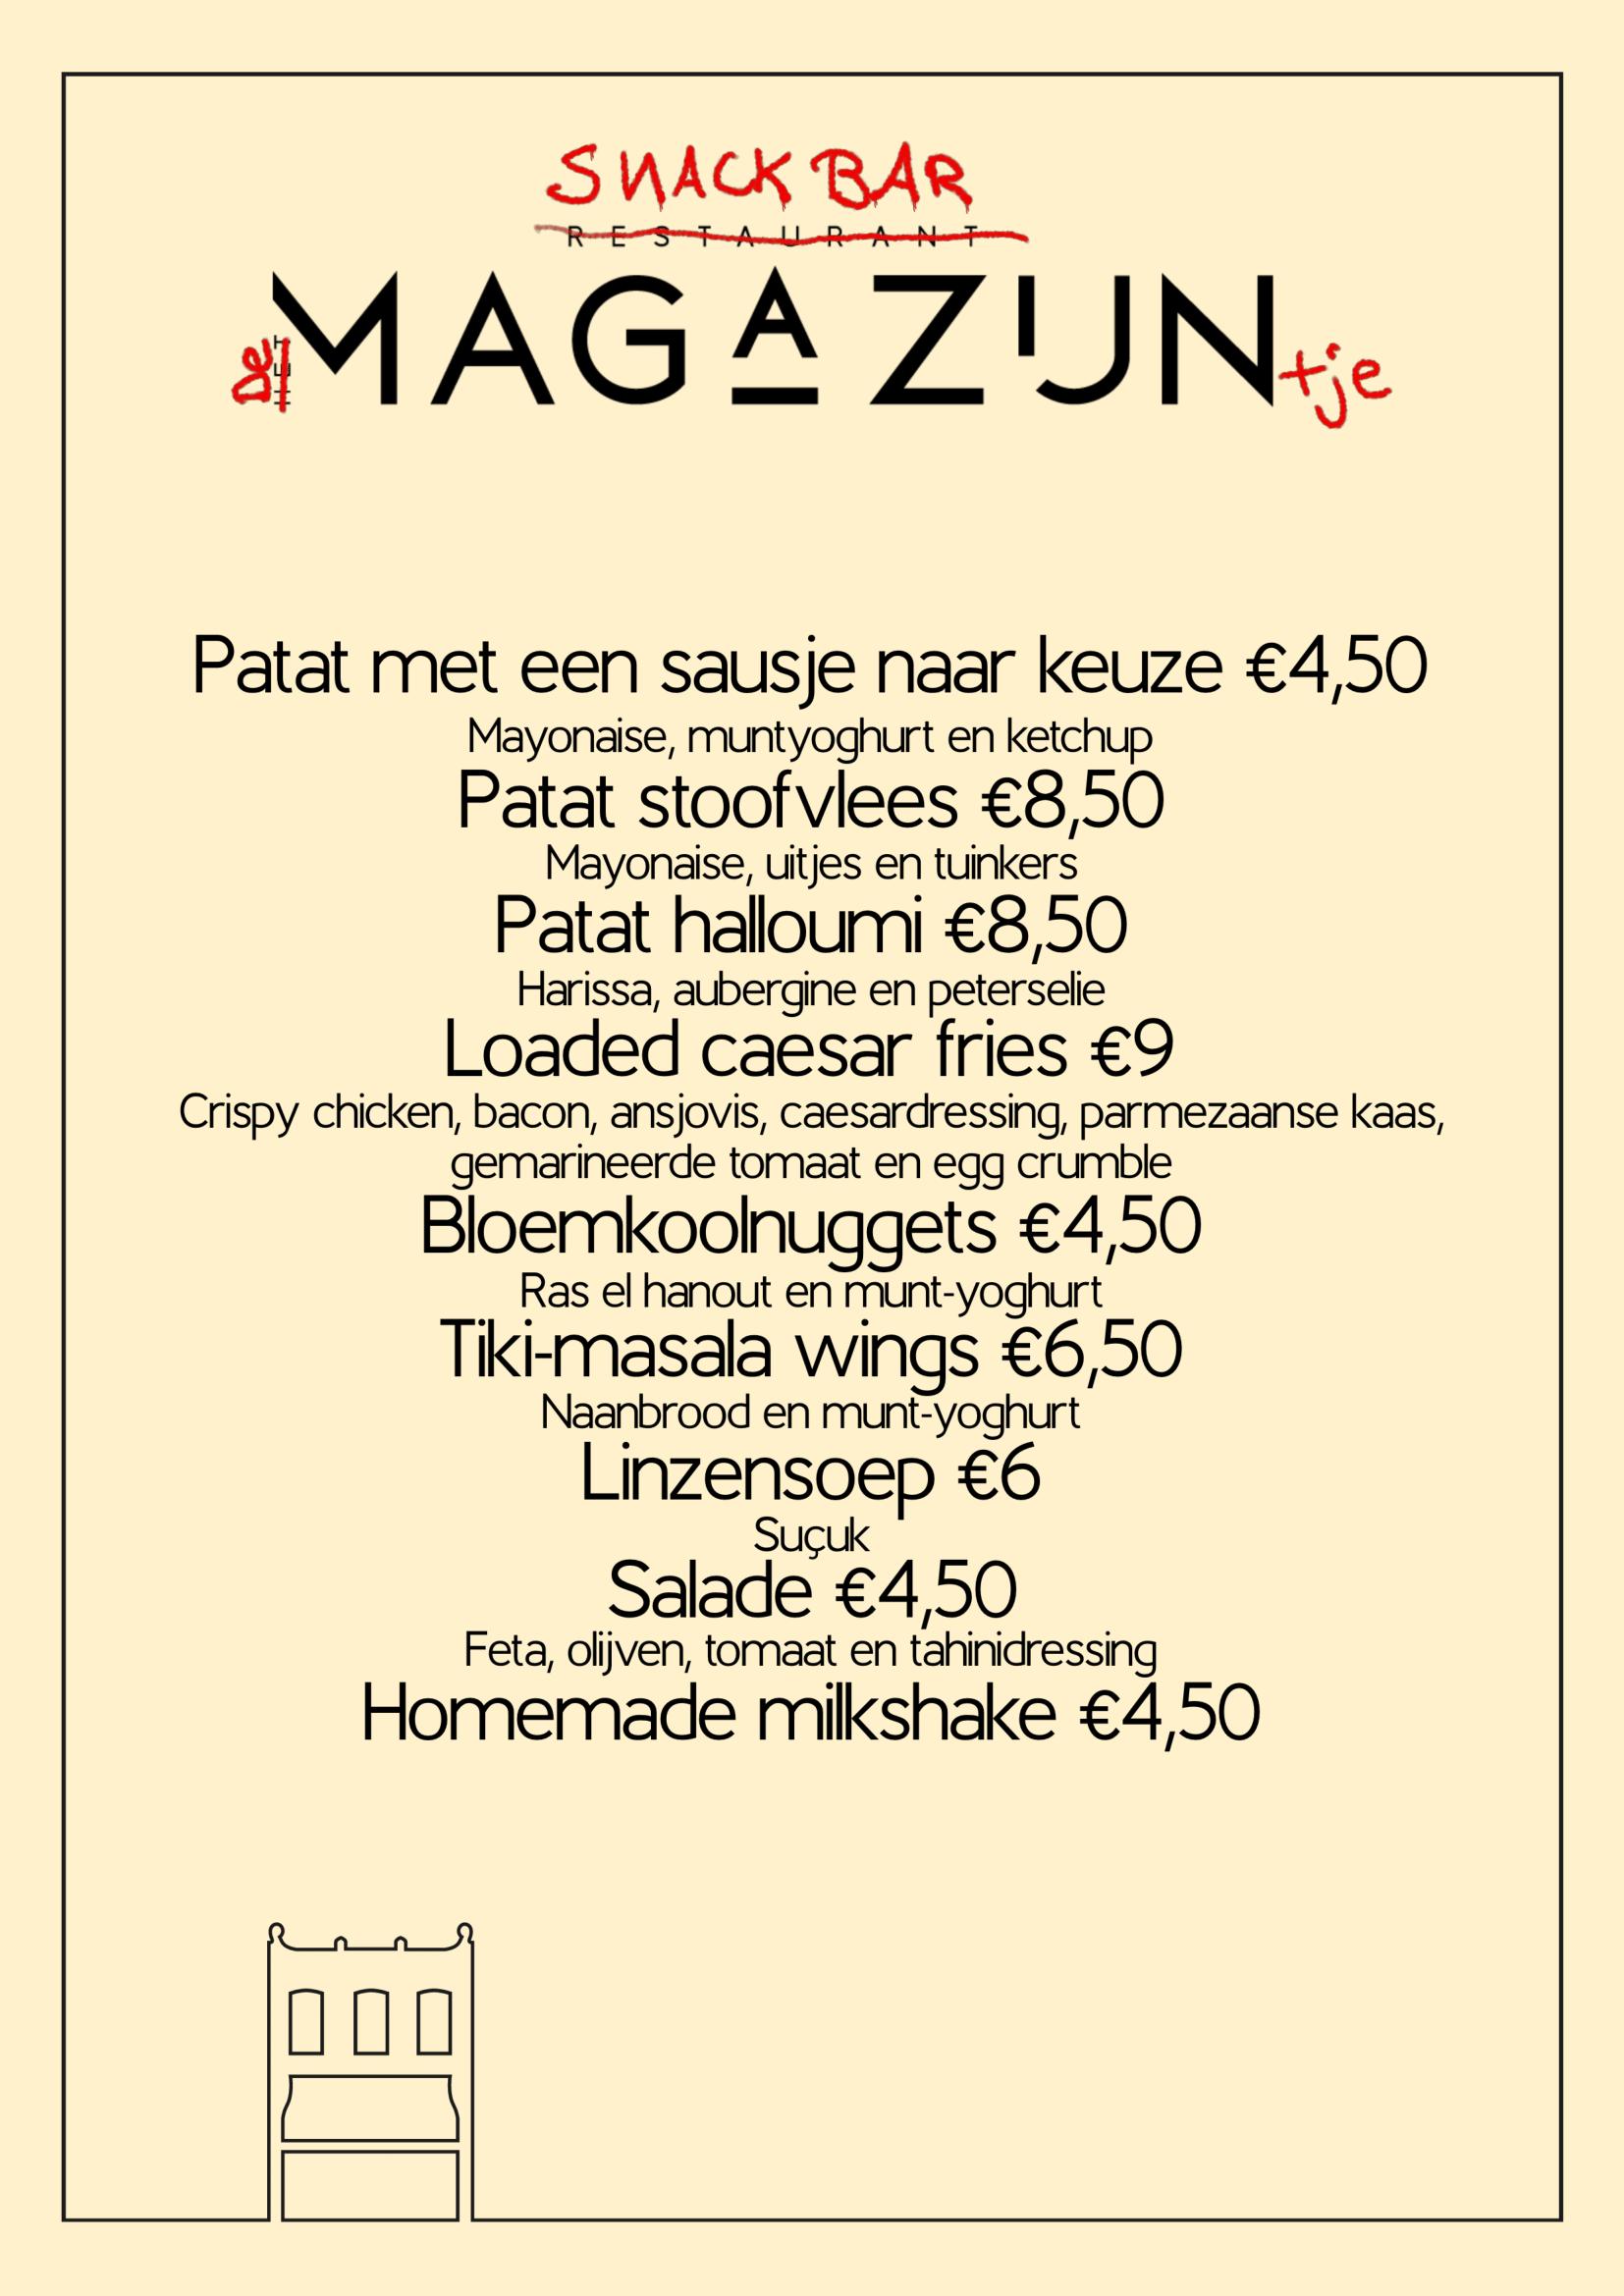 Snackbar menu